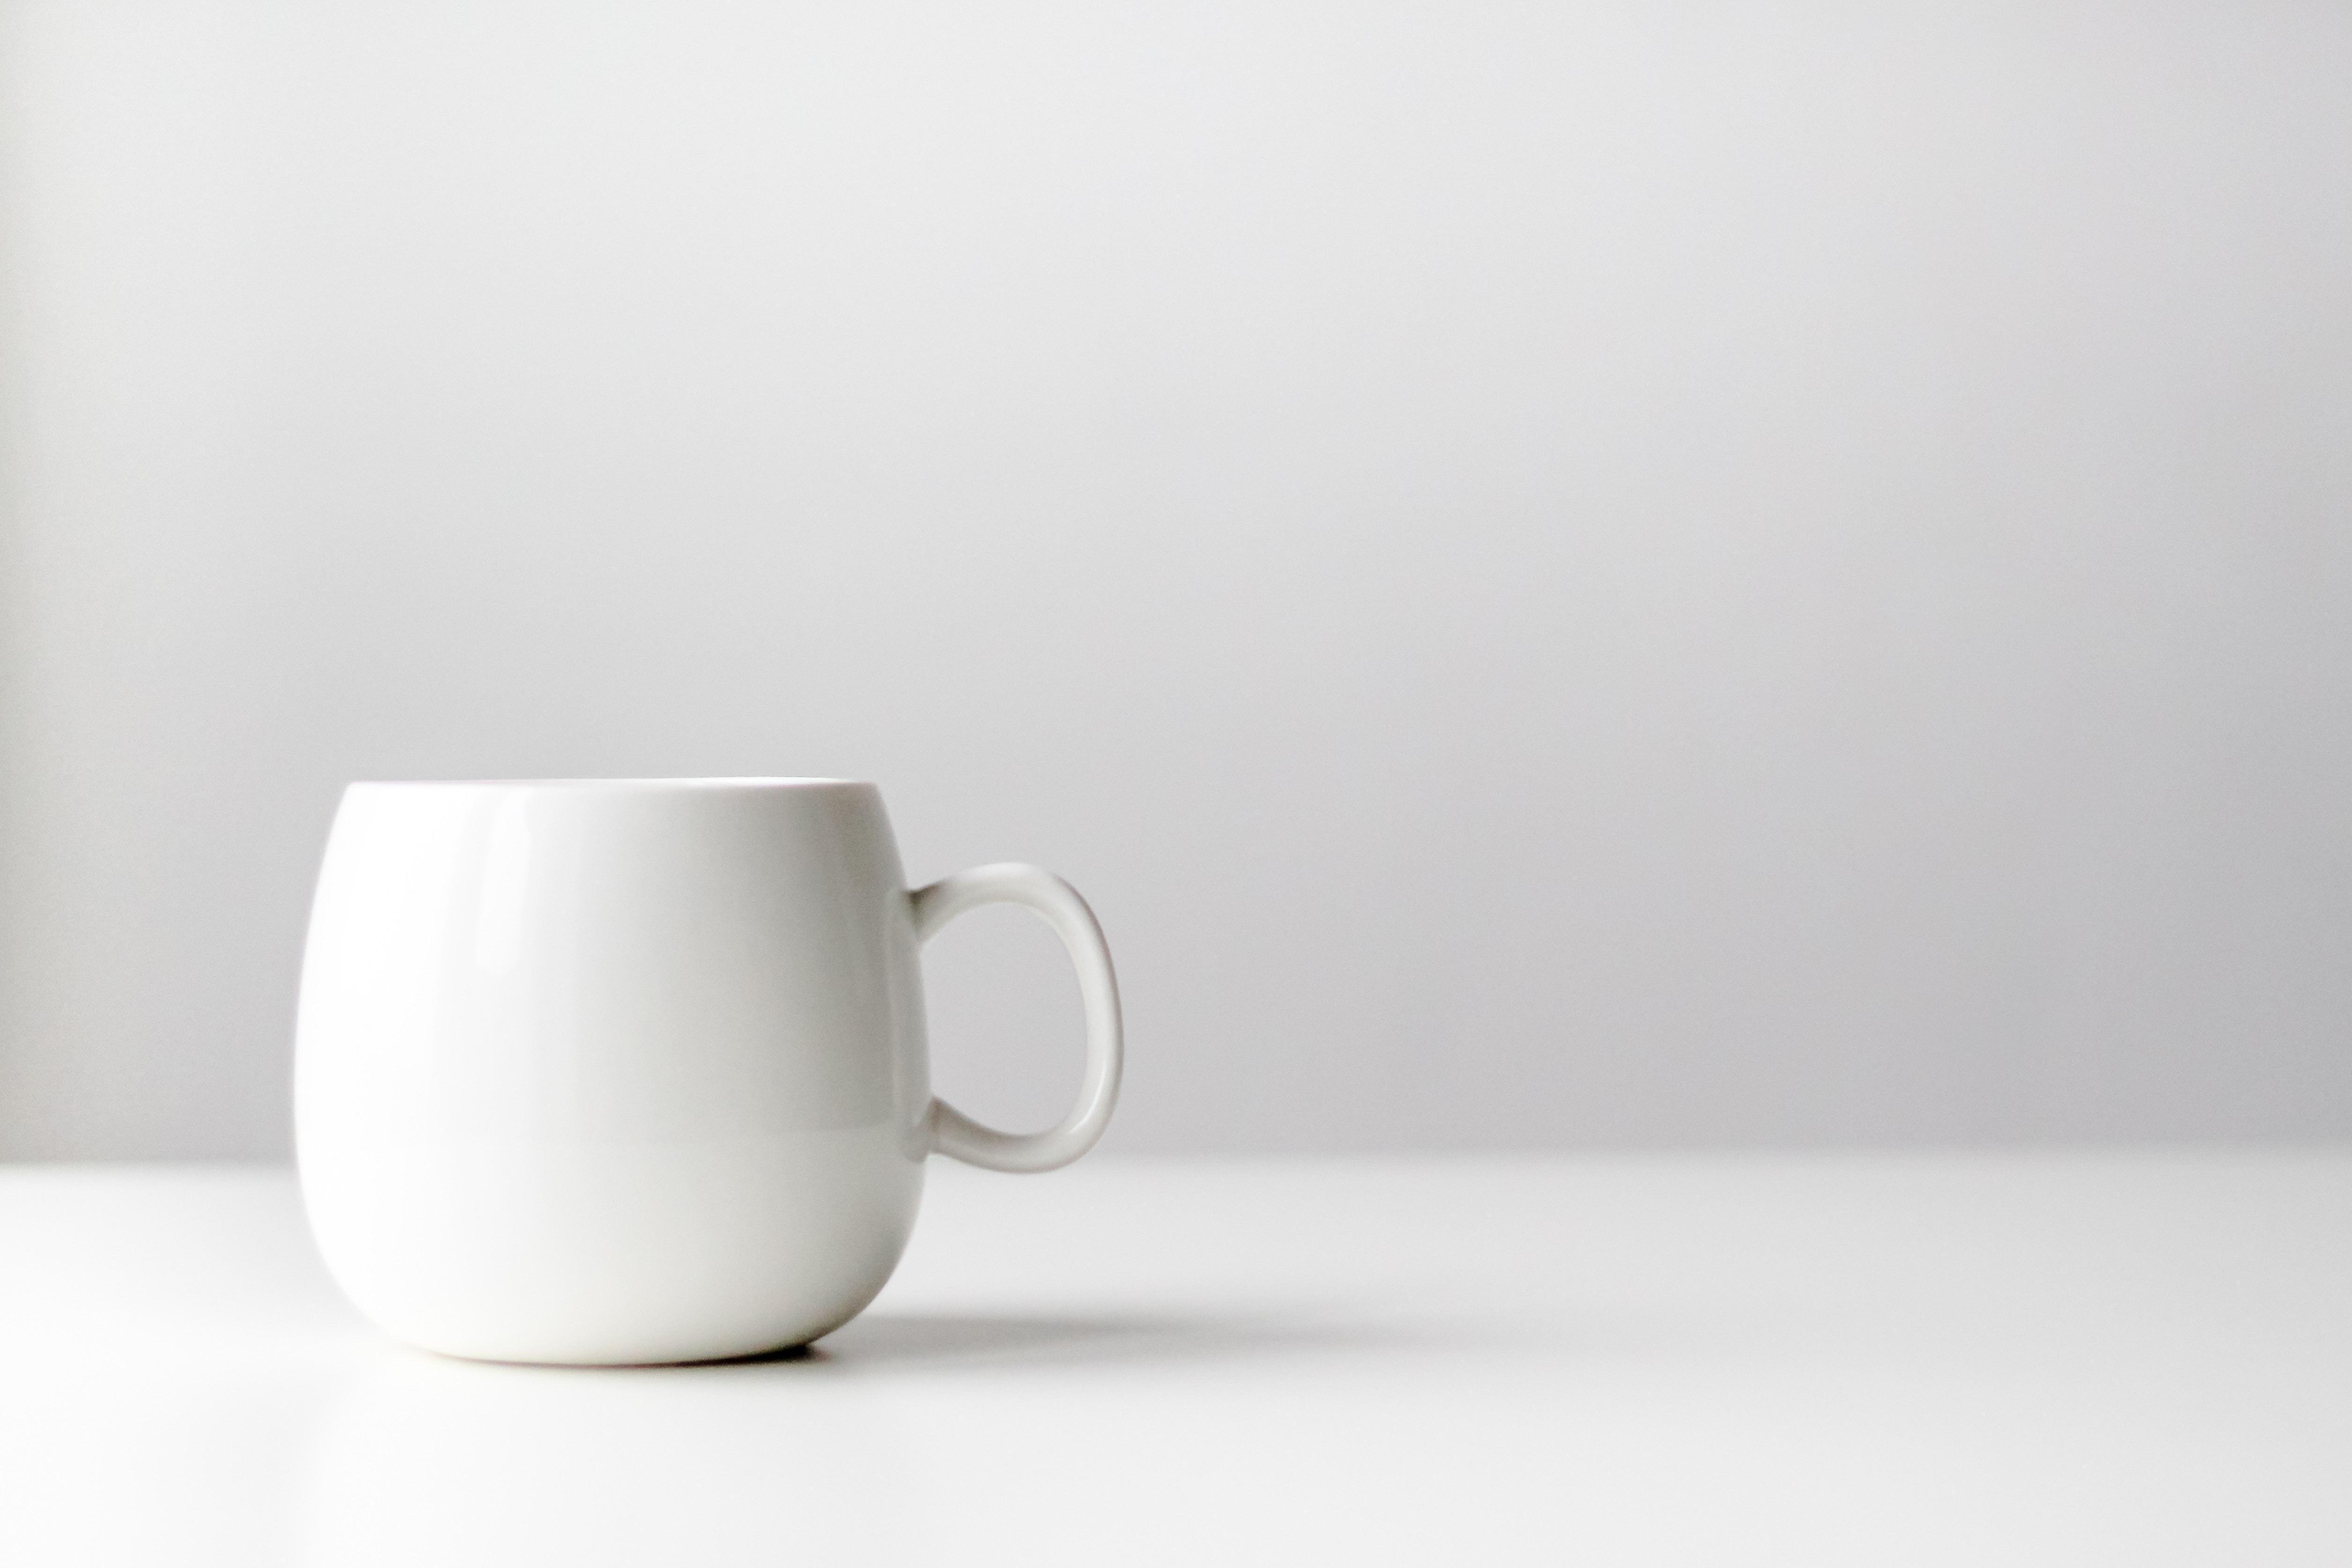 How To Mockup Your Logo On A Free Stock Photo Of A Coffee Mug Wegraphics